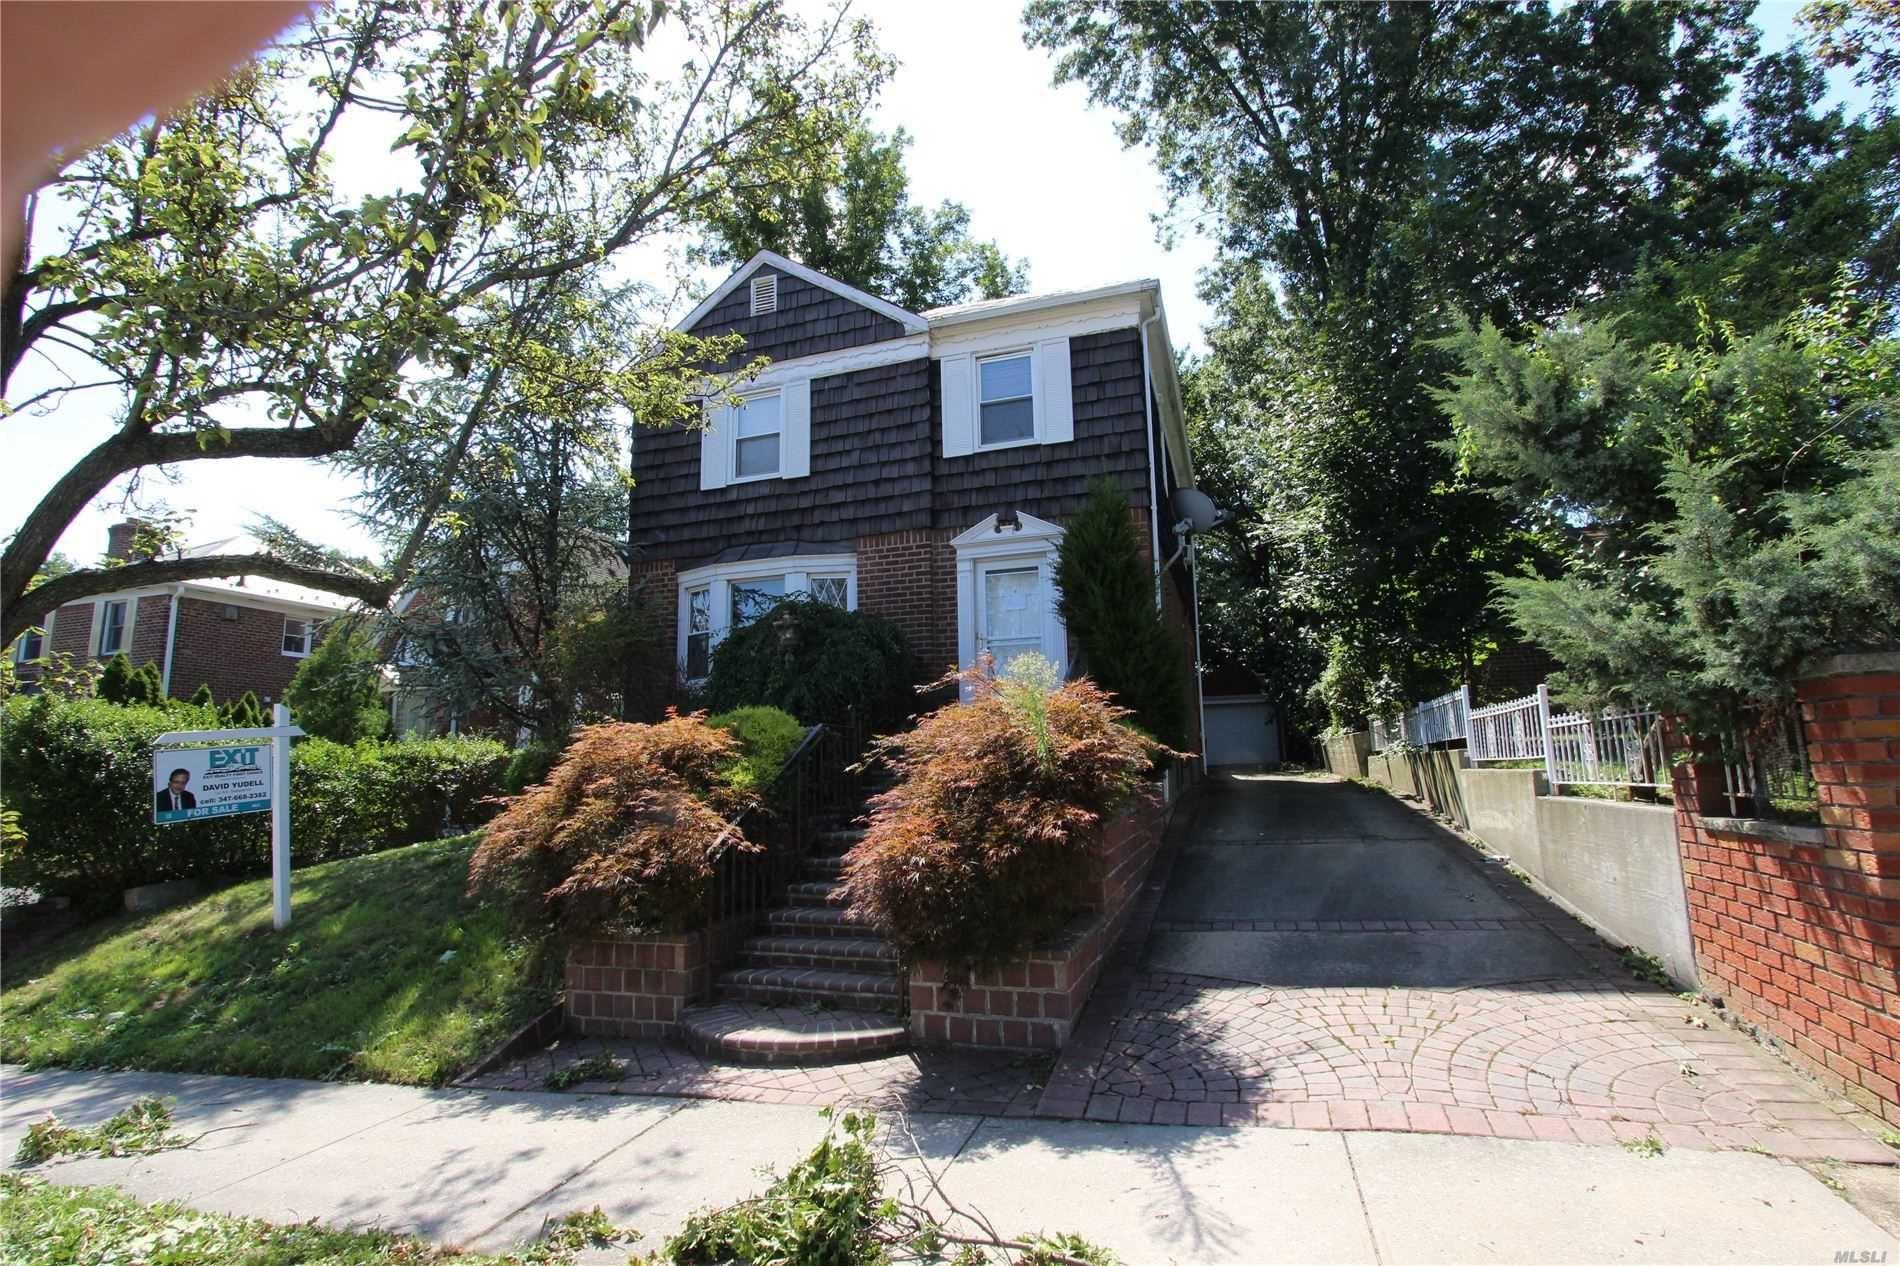 176-14 80 Road, Jamaica Estates, NY 11432 - MLS#: 3185646